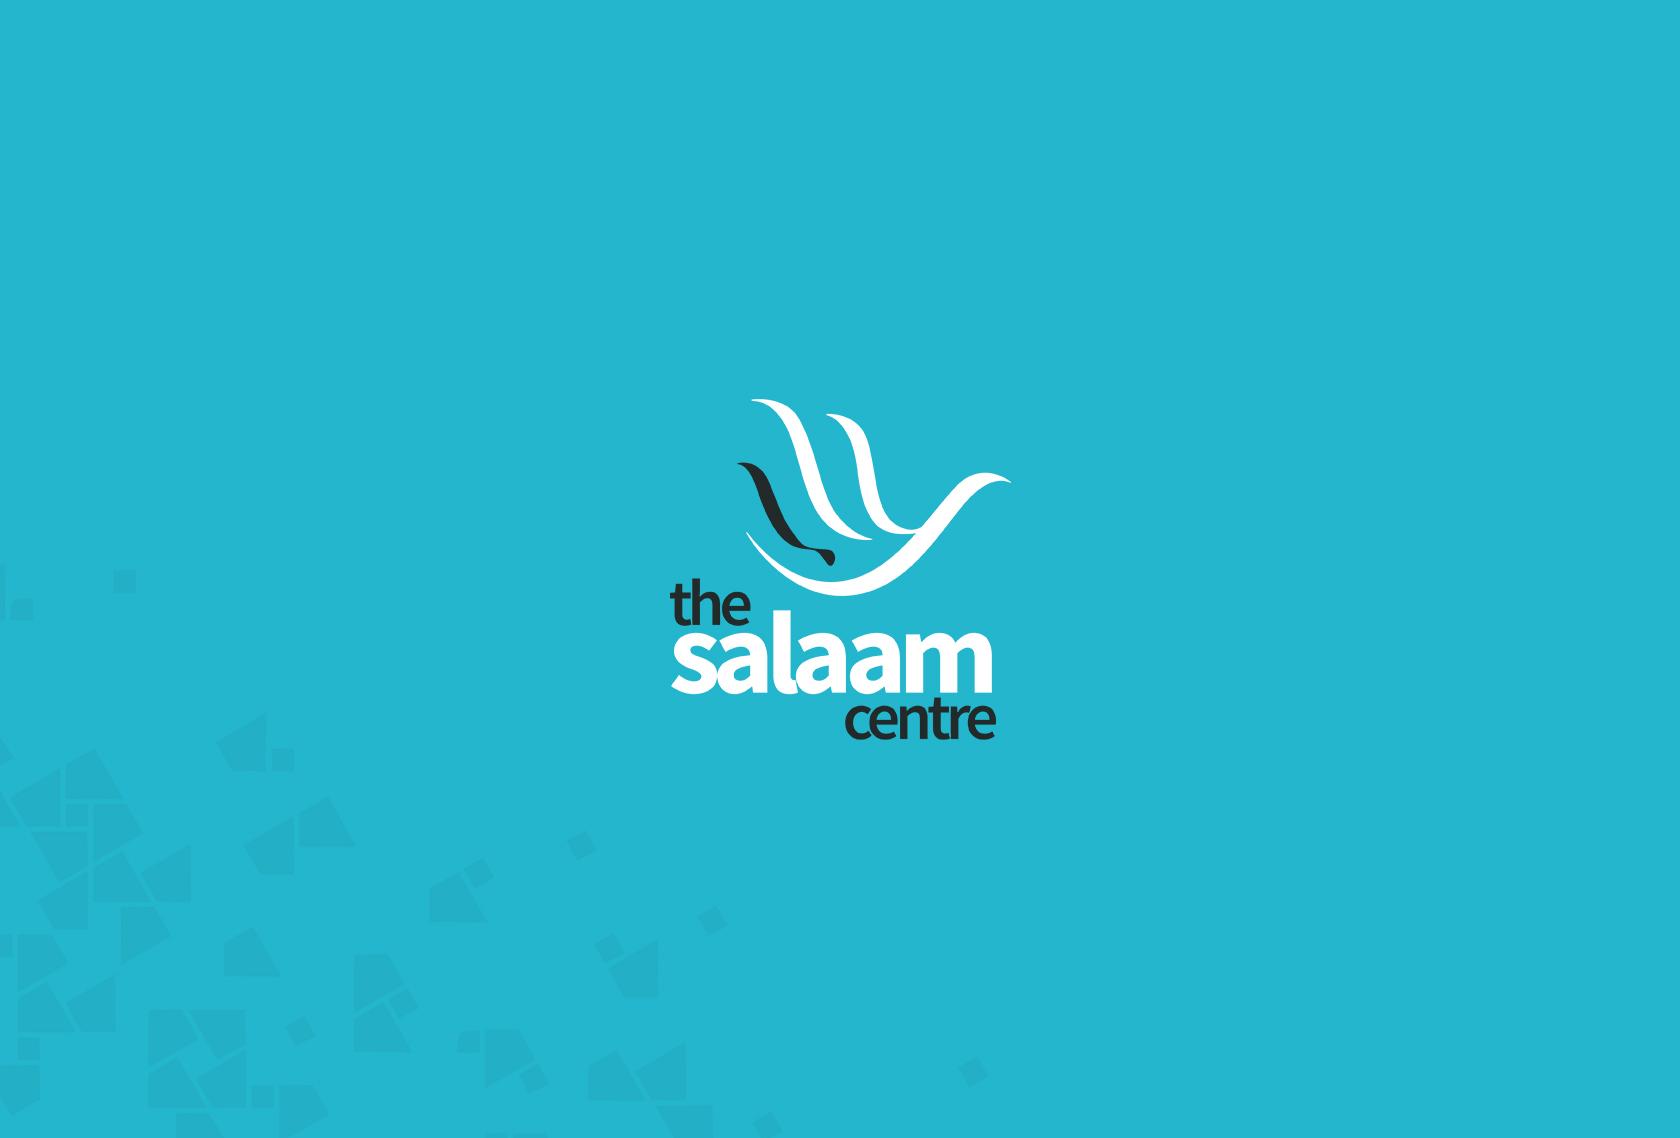 Salaam Logo Blue - The Salaam Centre (Branding) - Creative Digital